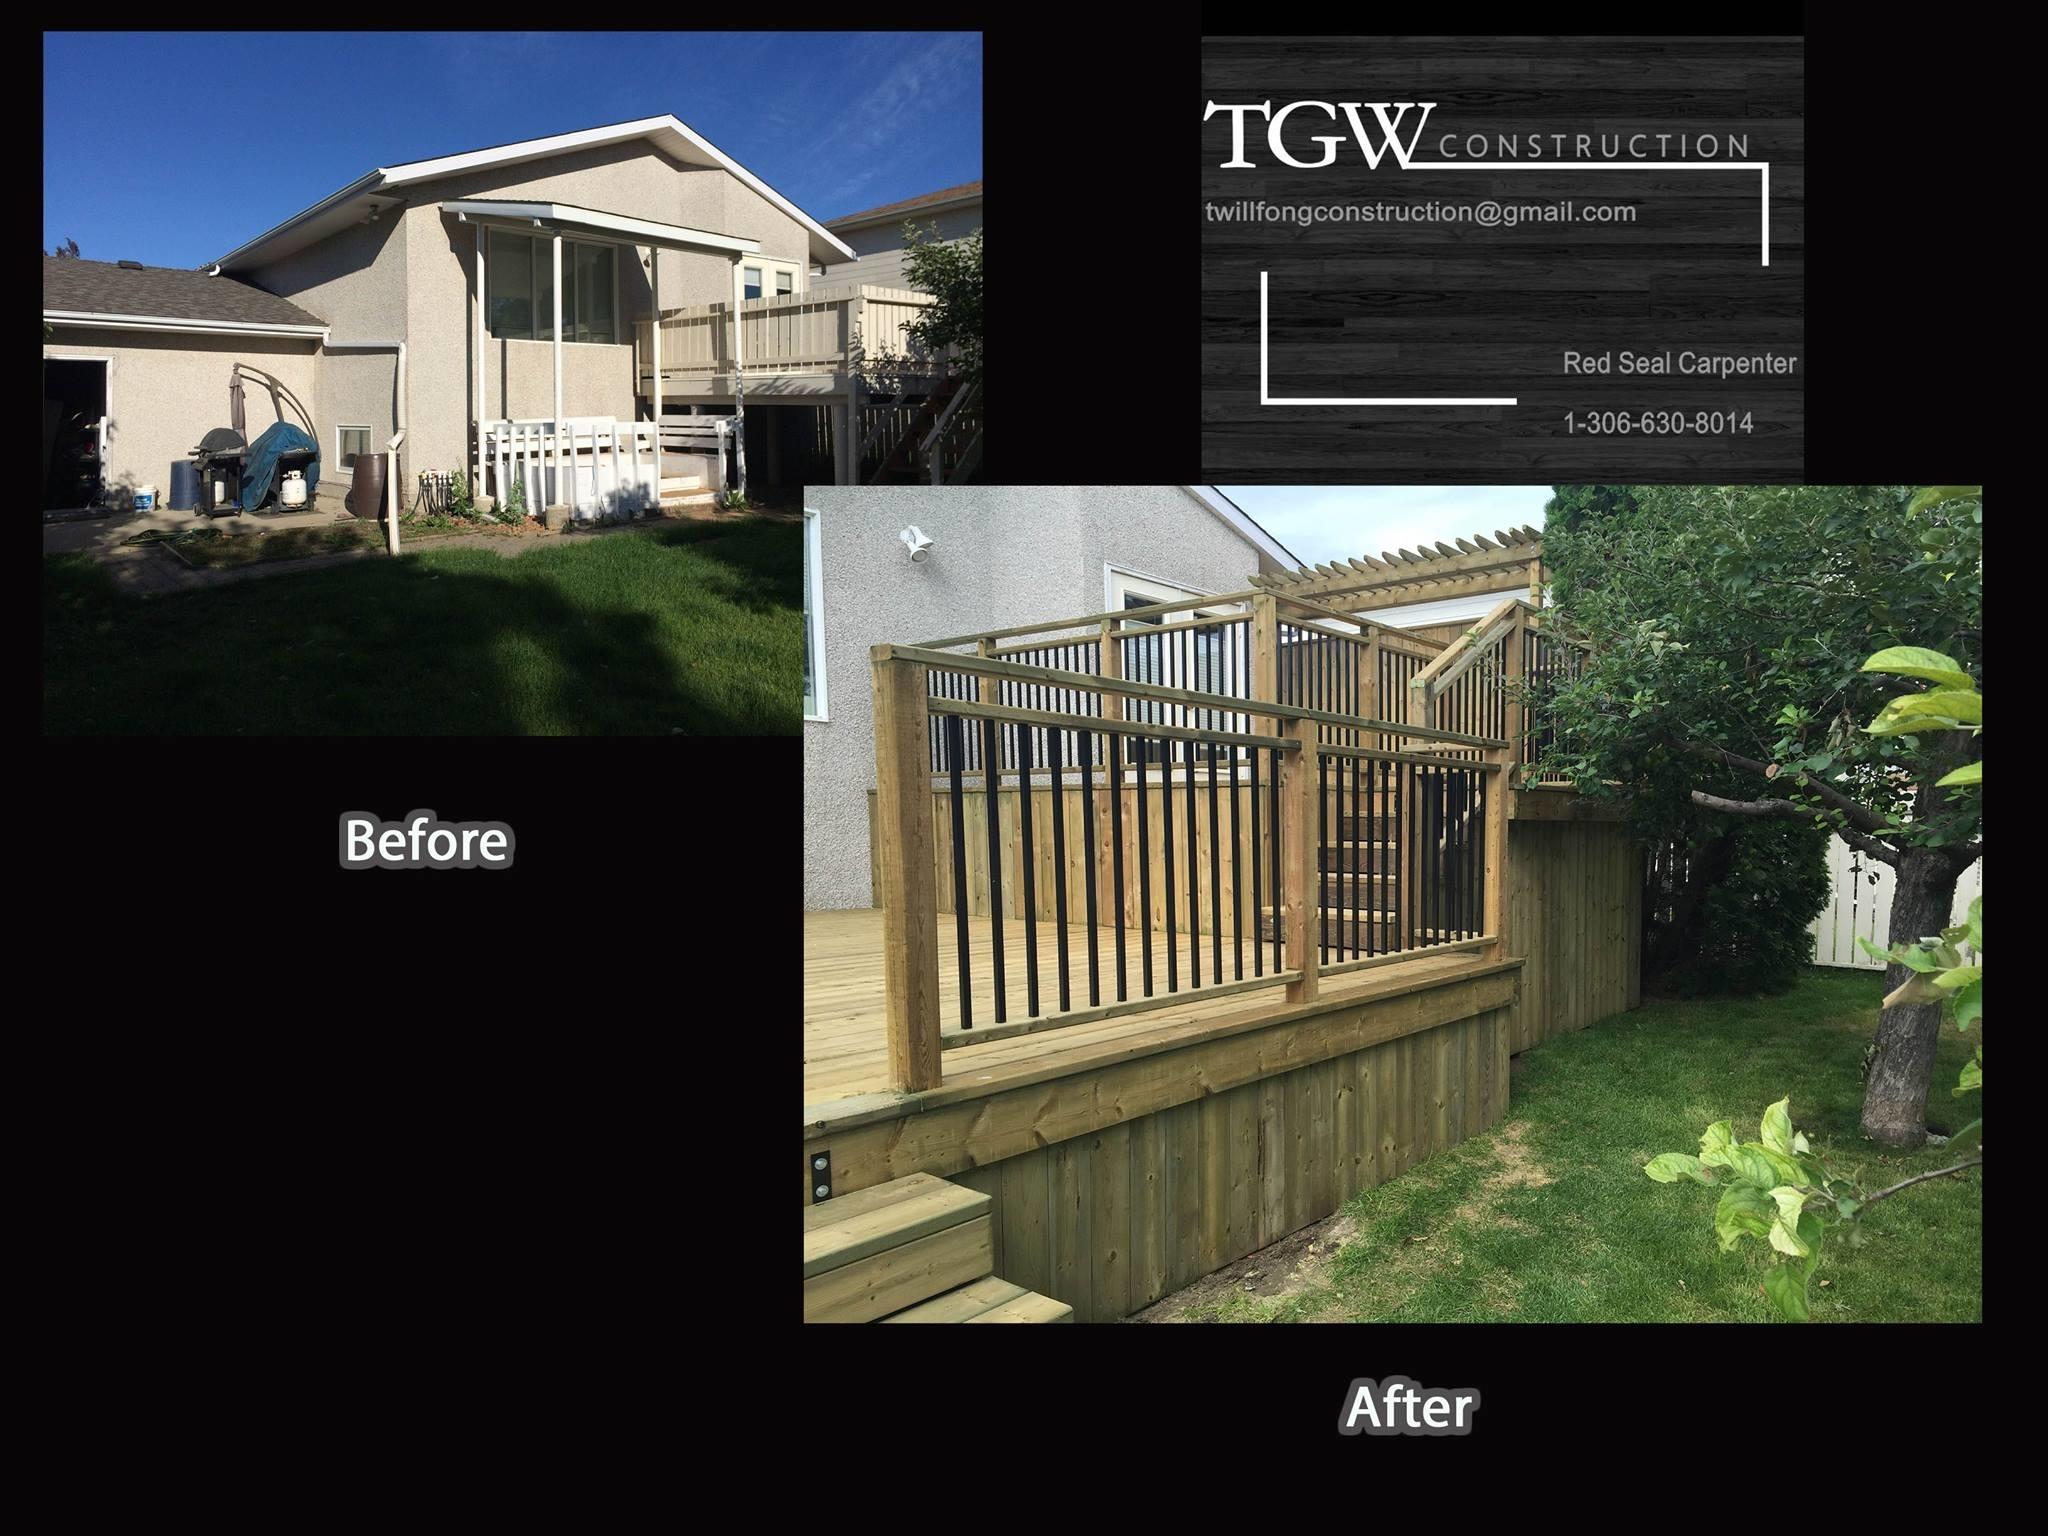 TGW Construction Inc Moose Jaw (306)630-8014